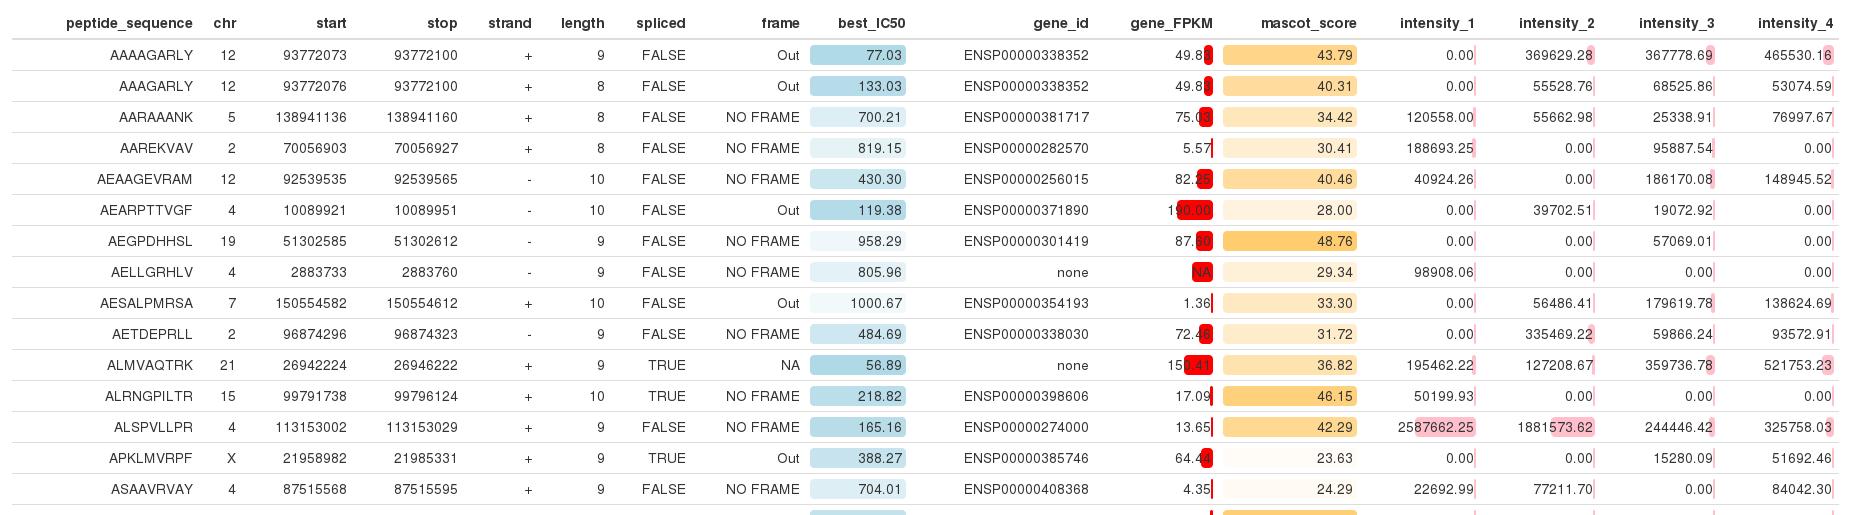 Create a nice looking table using R – IRIC\'s Bioinformatics Platform